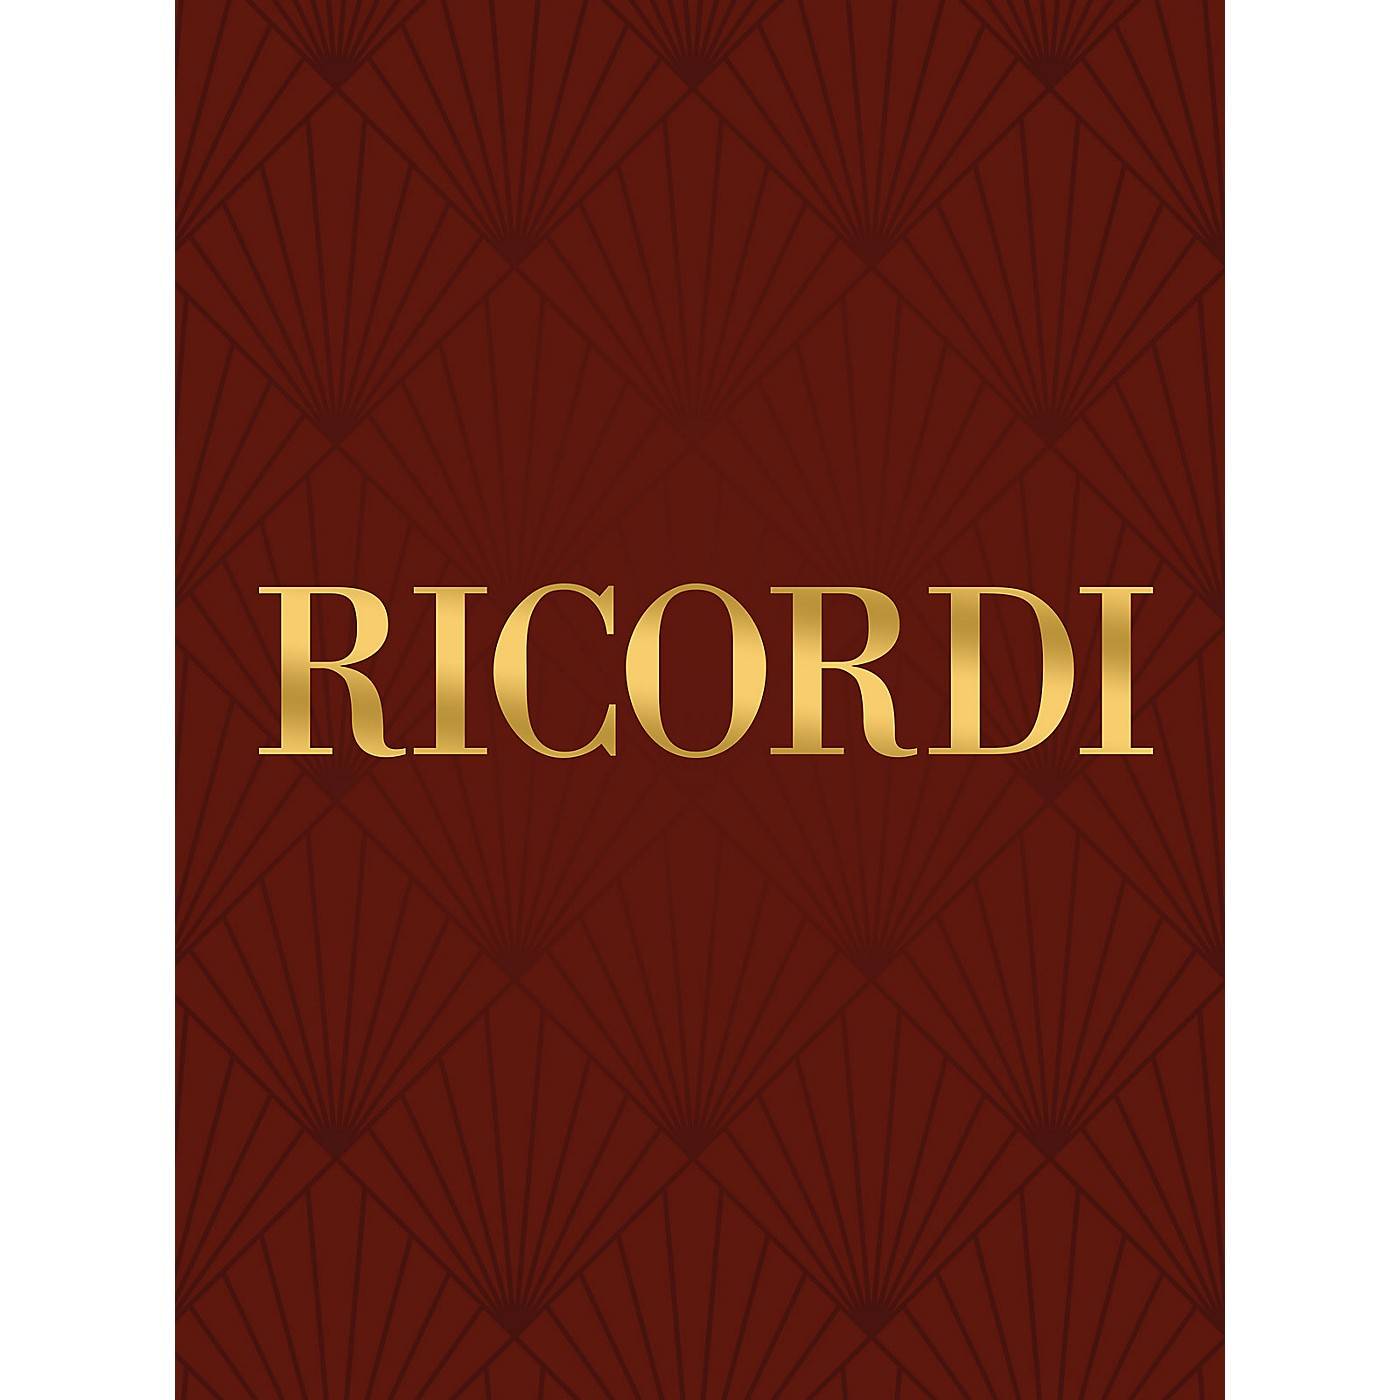 Ricordi Prendi l'anel ti dono from La sonnambula (Soprano/Tenor, It) Vocal Ensemble Series by Vincenzo Bellini thumbnail